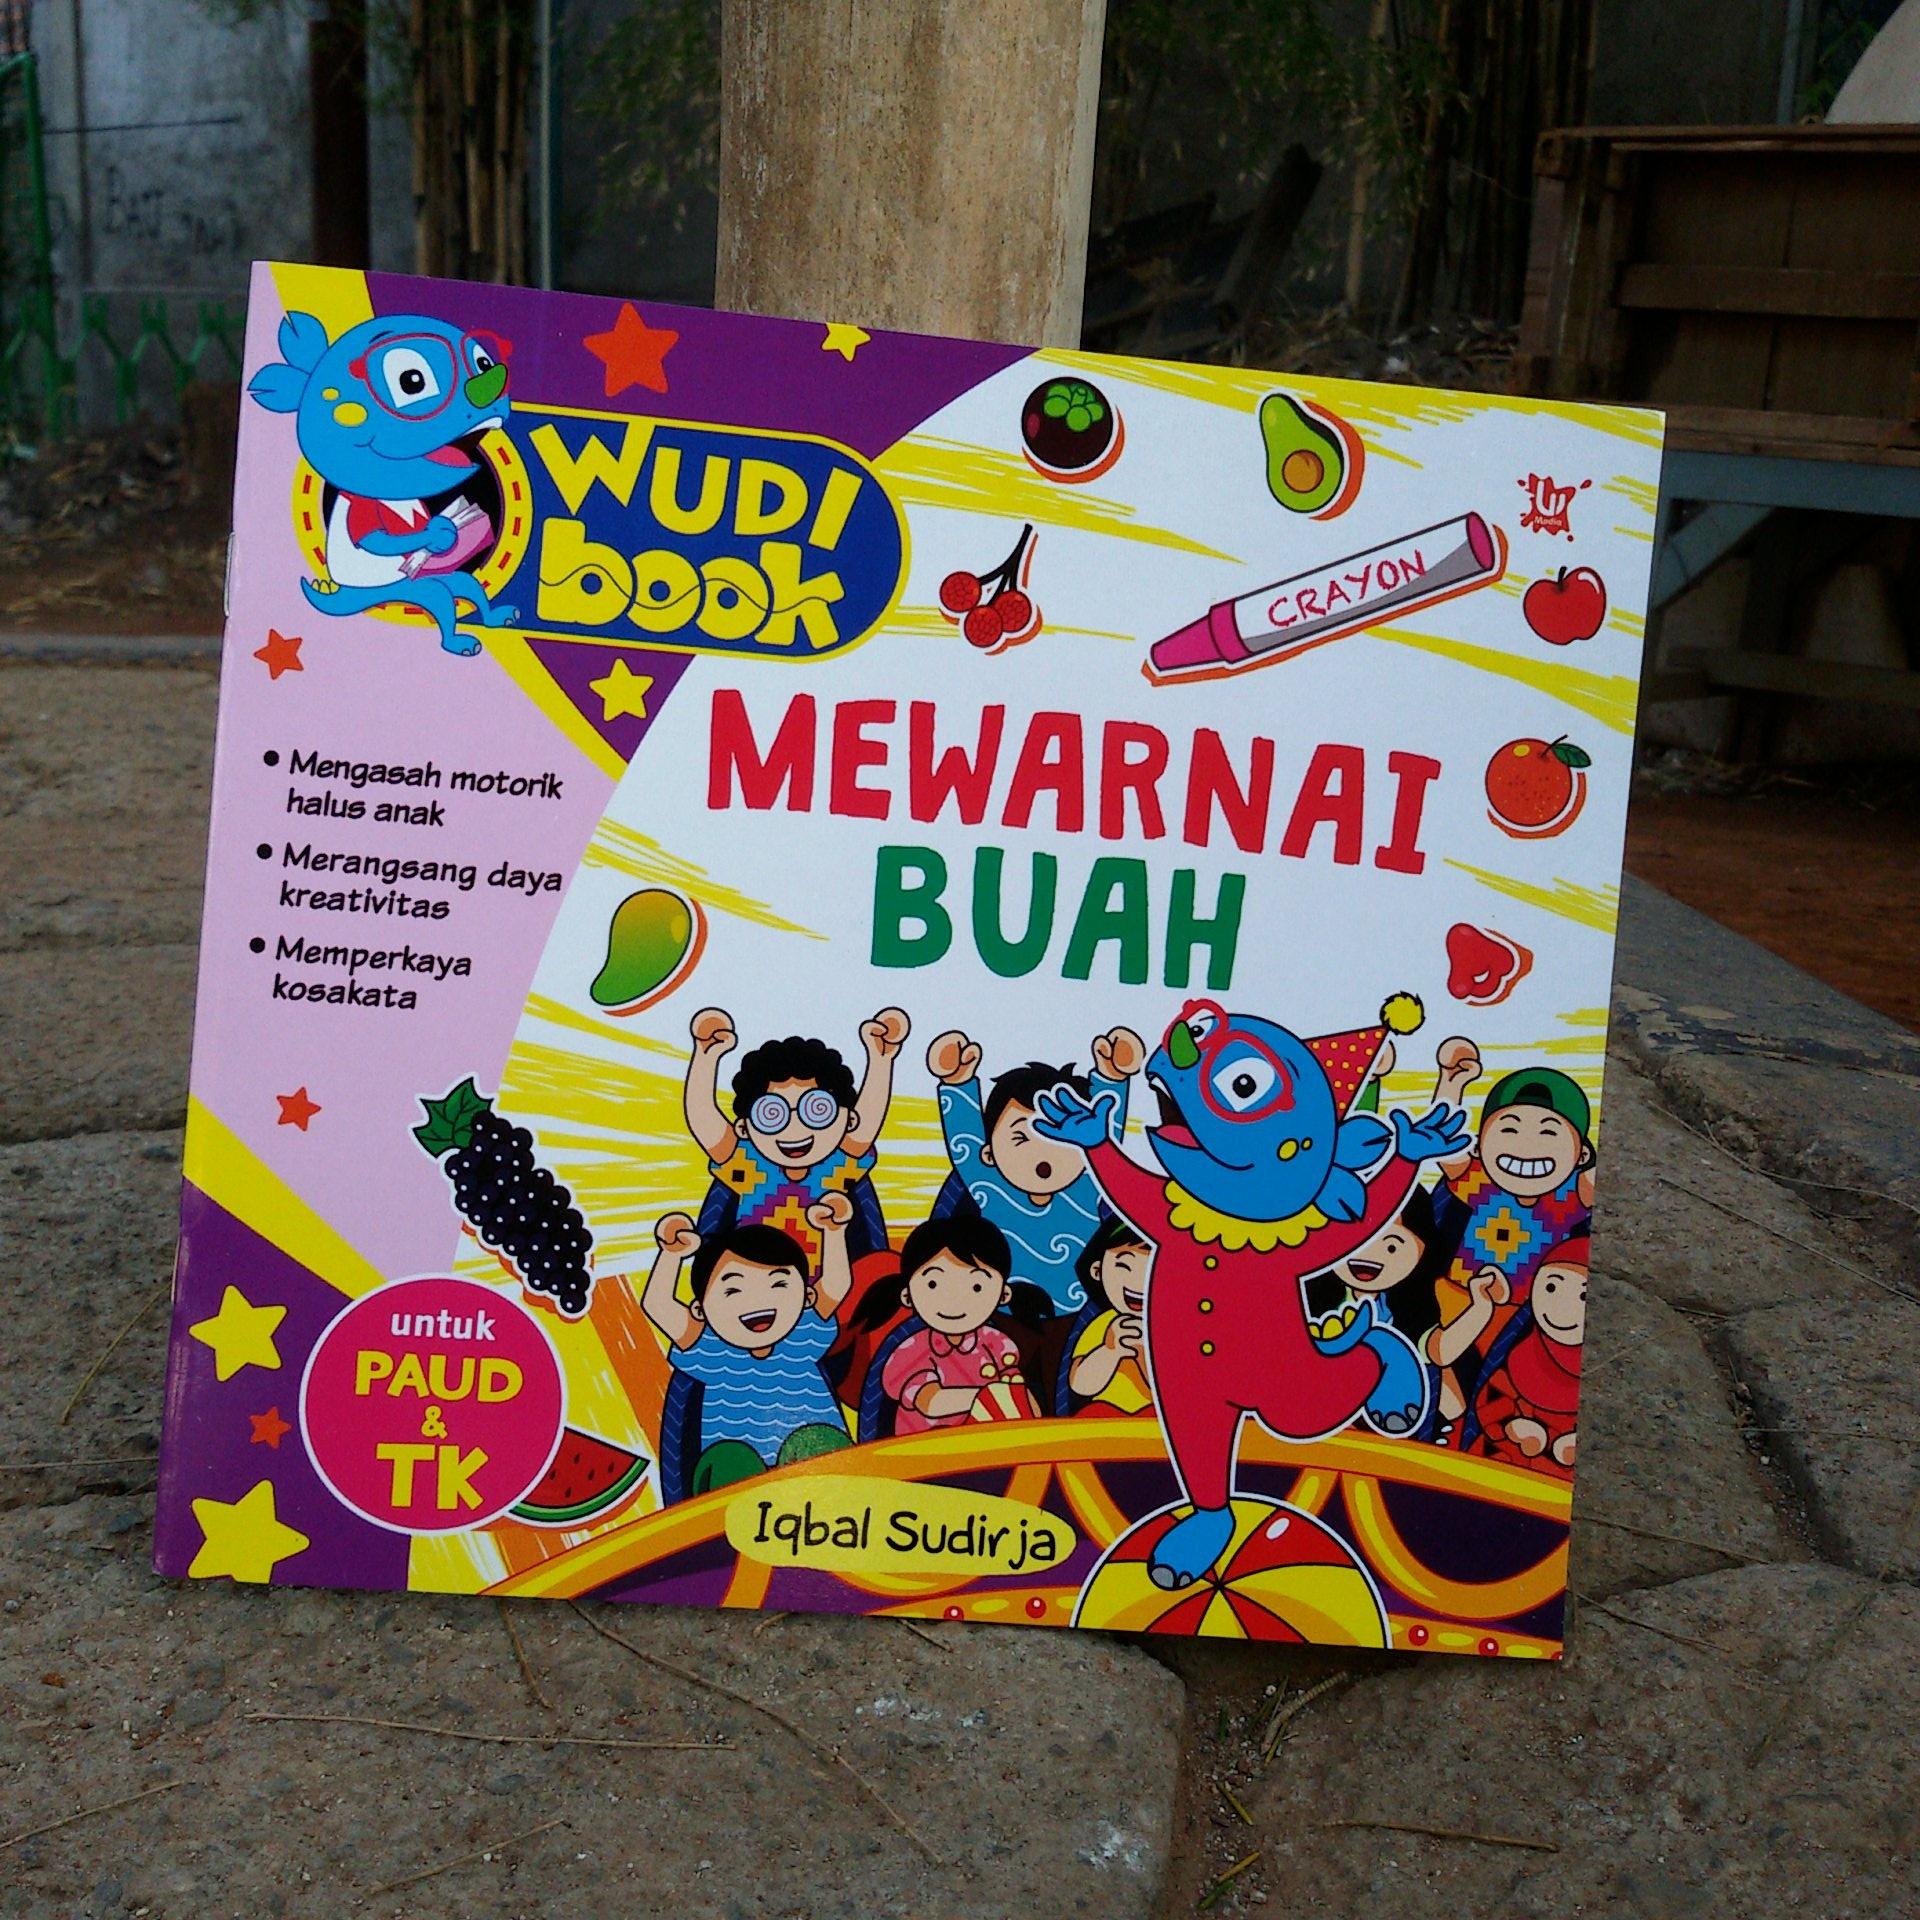 Jual Buku Aktivitas Keterampilan Anak Mewarnai Buah Buahan Paud Tk